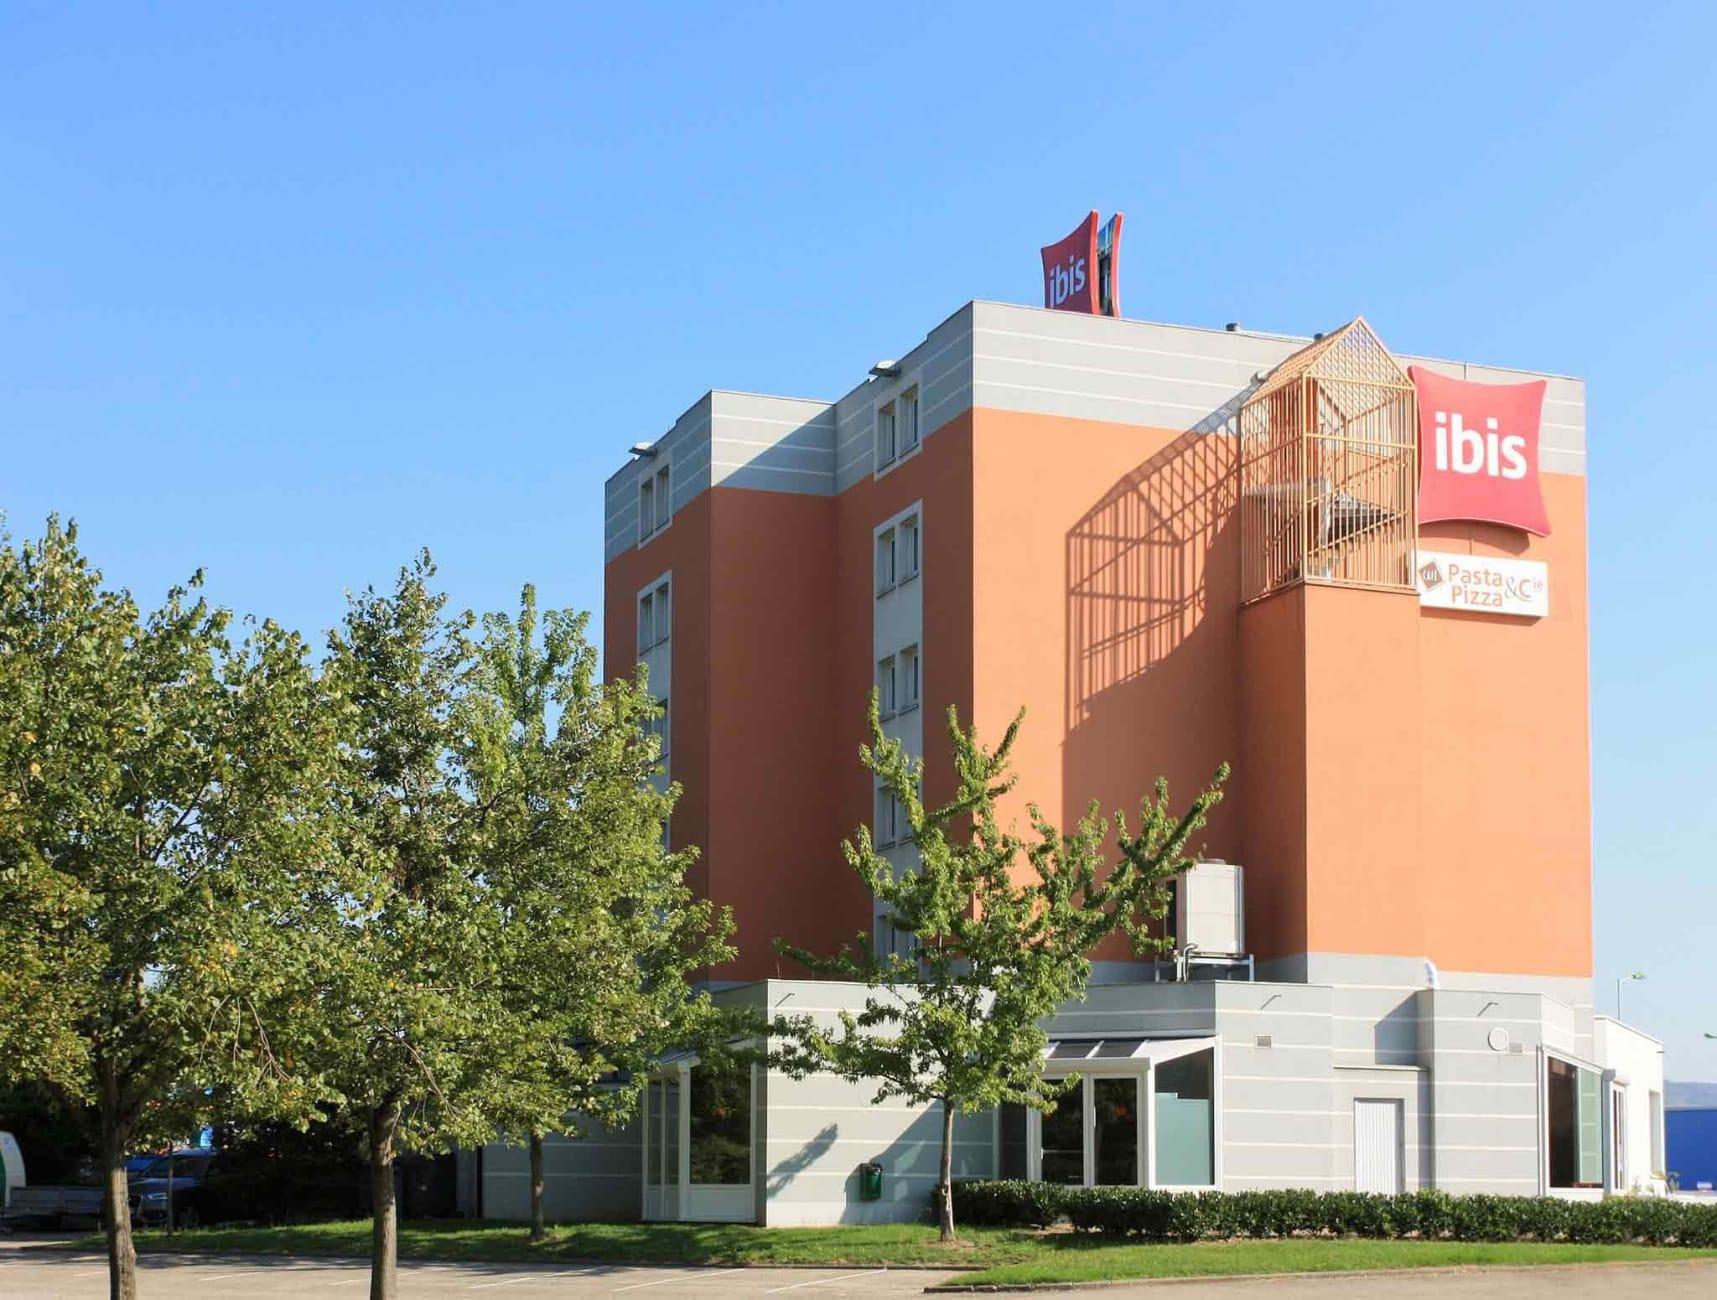 Hotel Ibis Lyon Sud Chasse Sur Rhone